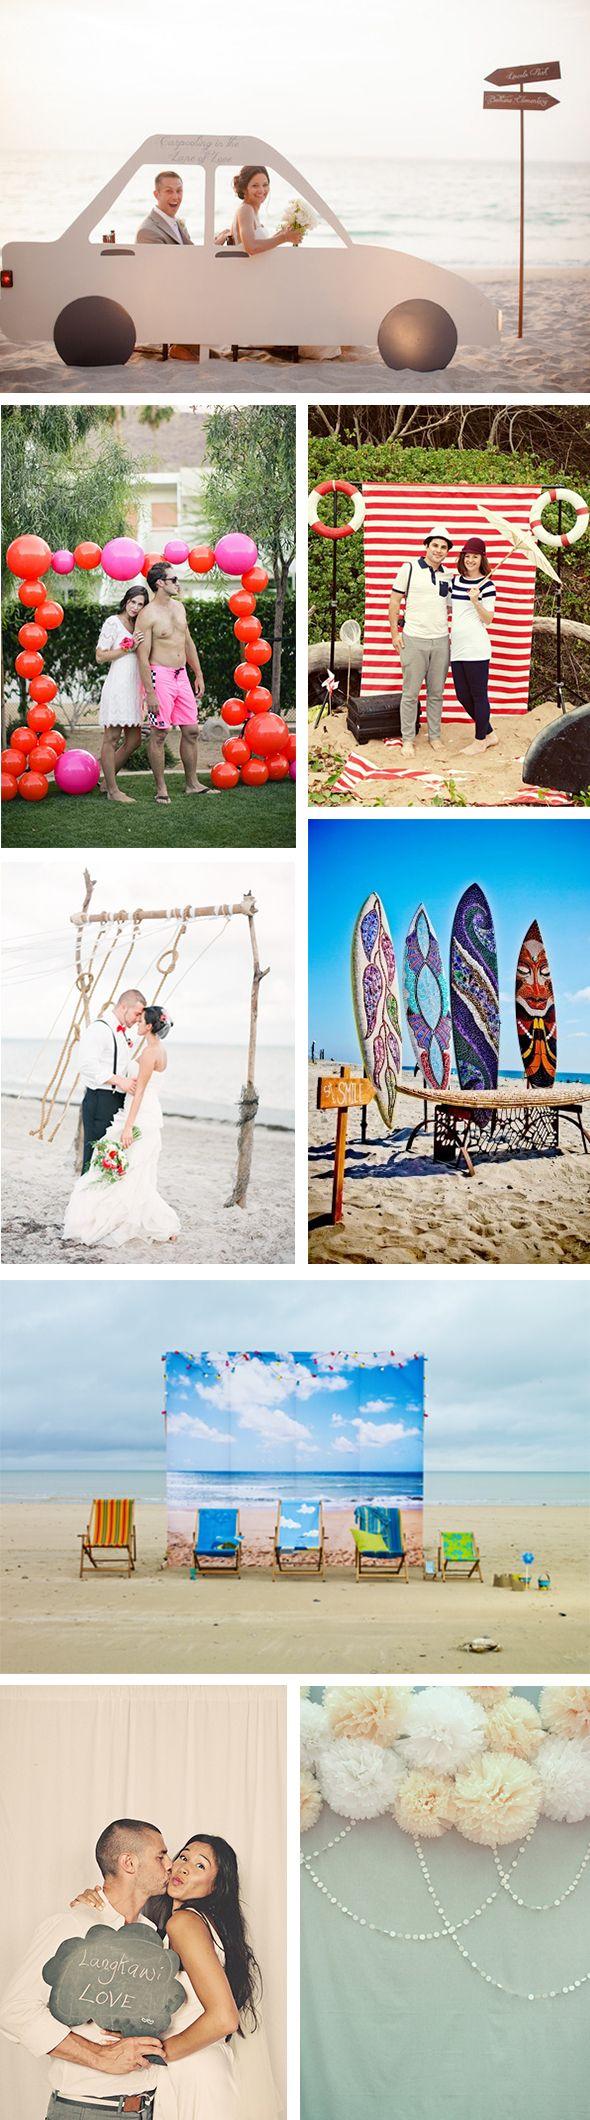 Pin By Lisa Berl On True Beach Wedding Photos Wedding Photo Booth Fun Wedding Photography